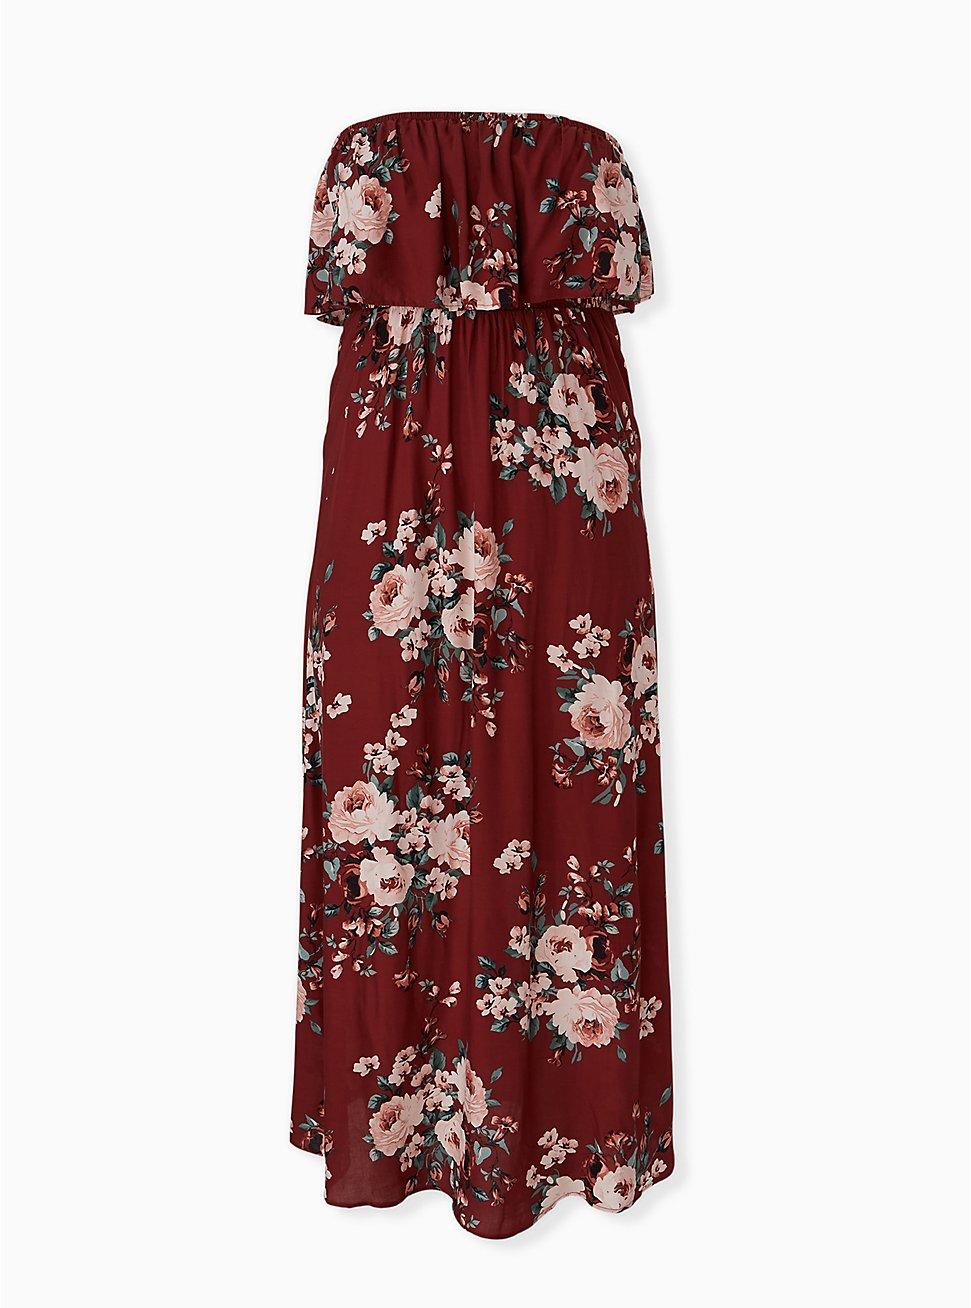 Brick Red Floral Challis Strapless Maxi Dress, FLORALS-BROWN, hi-res